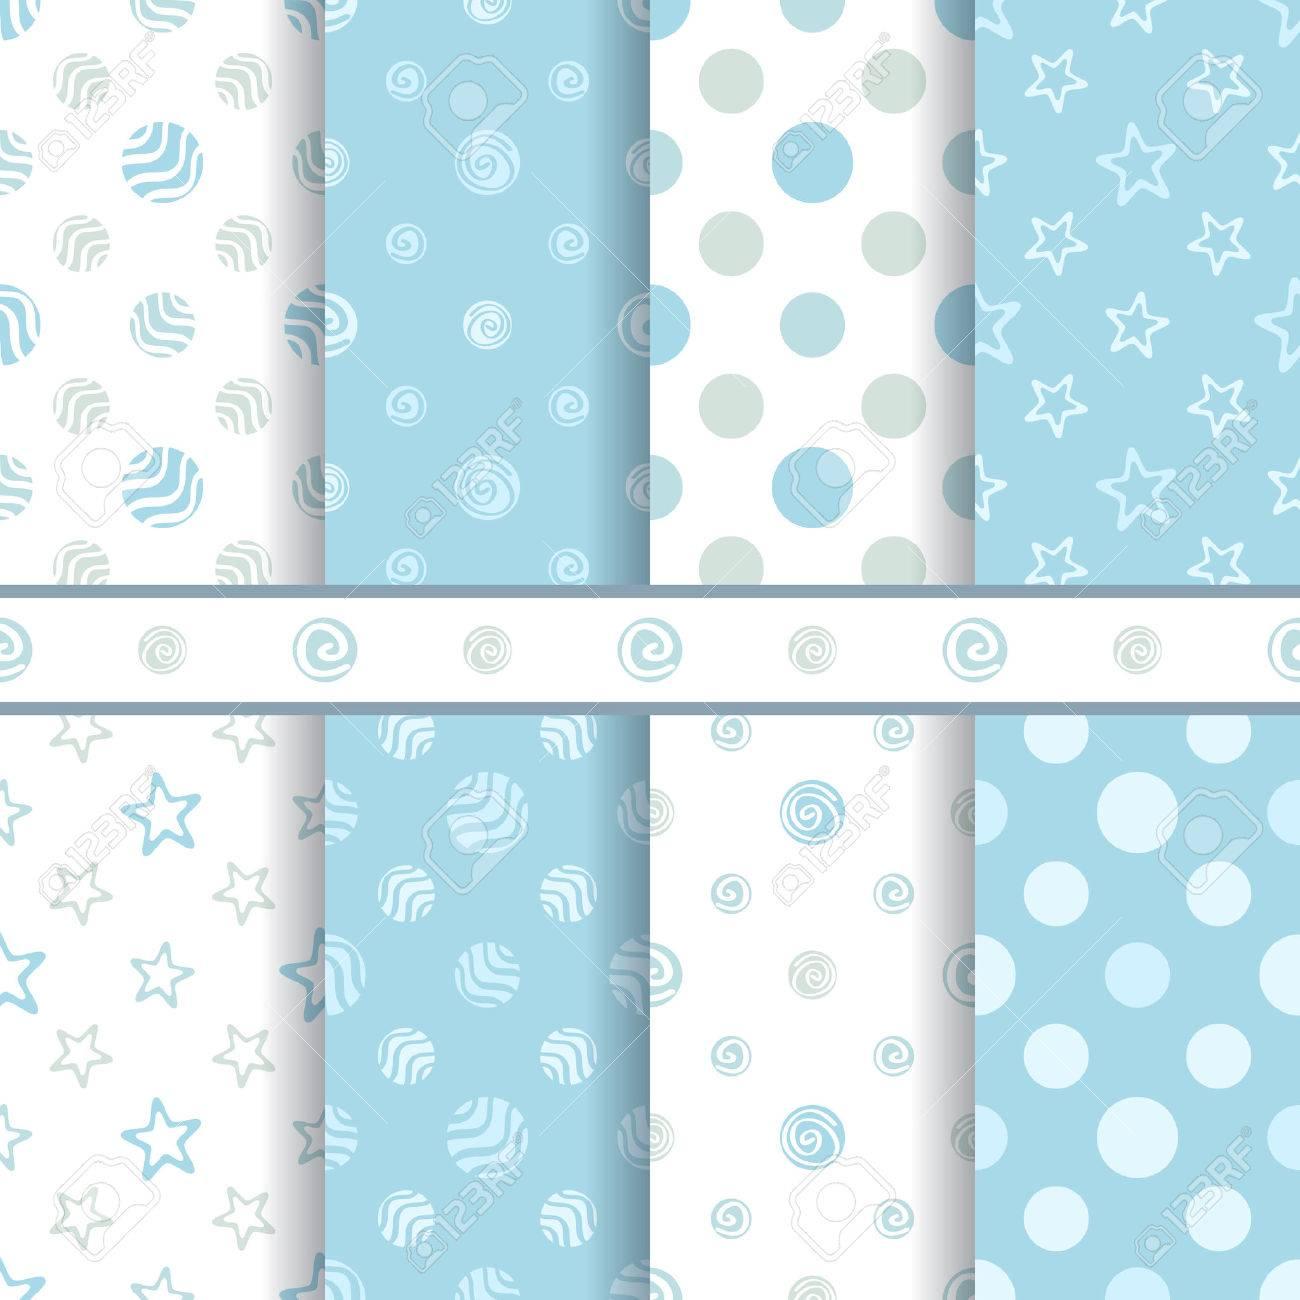 f68d4e305fa7 Cute Baby Vector Patterns Set - Seamless Boy Blue Texture Royalty ...